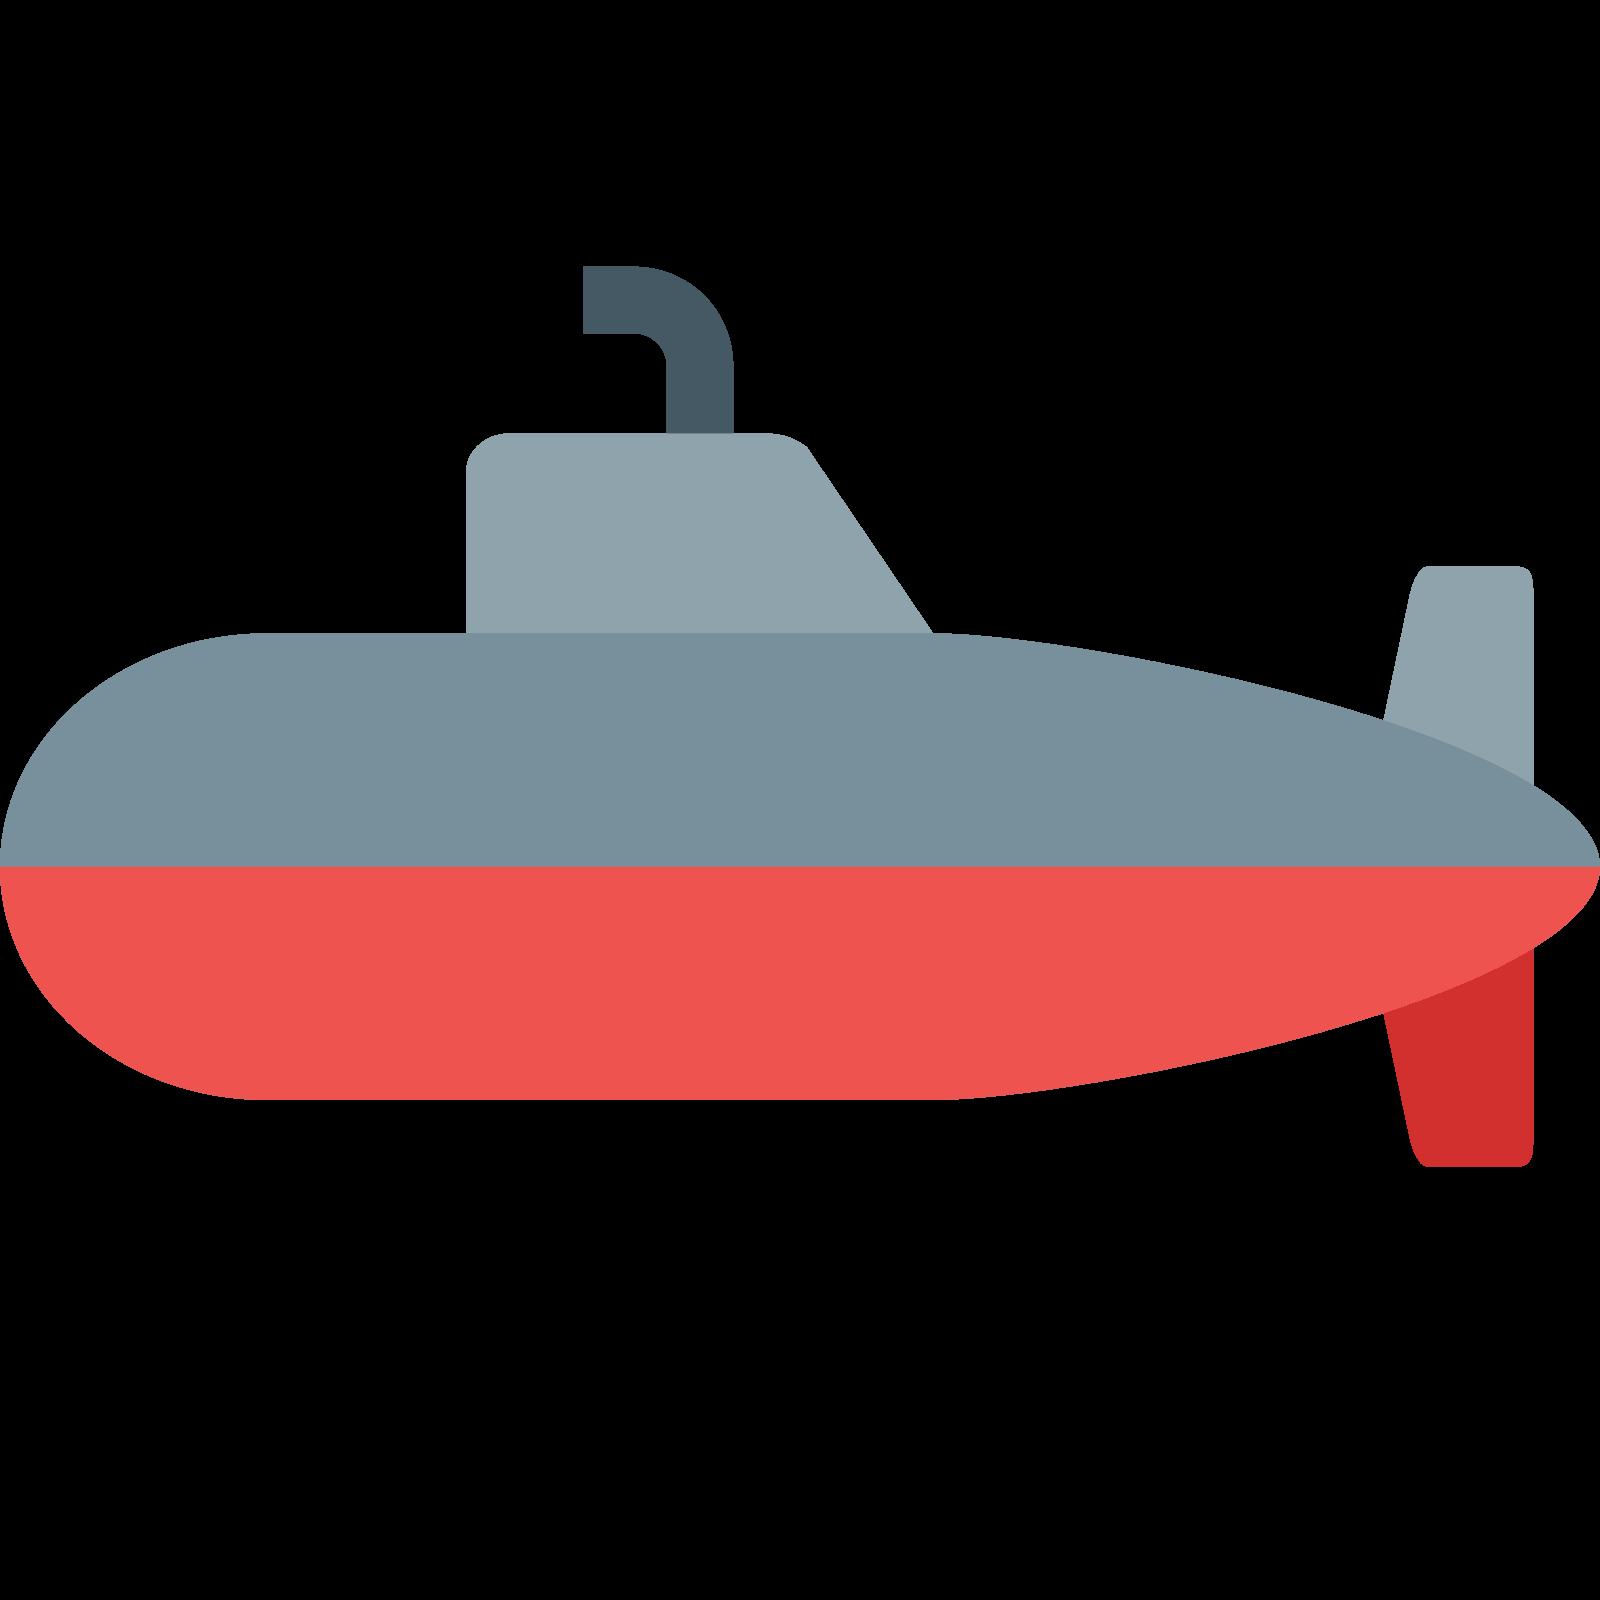 1600x1600 19 Submarine Vector Huge Freebie! Download For Powerpoint